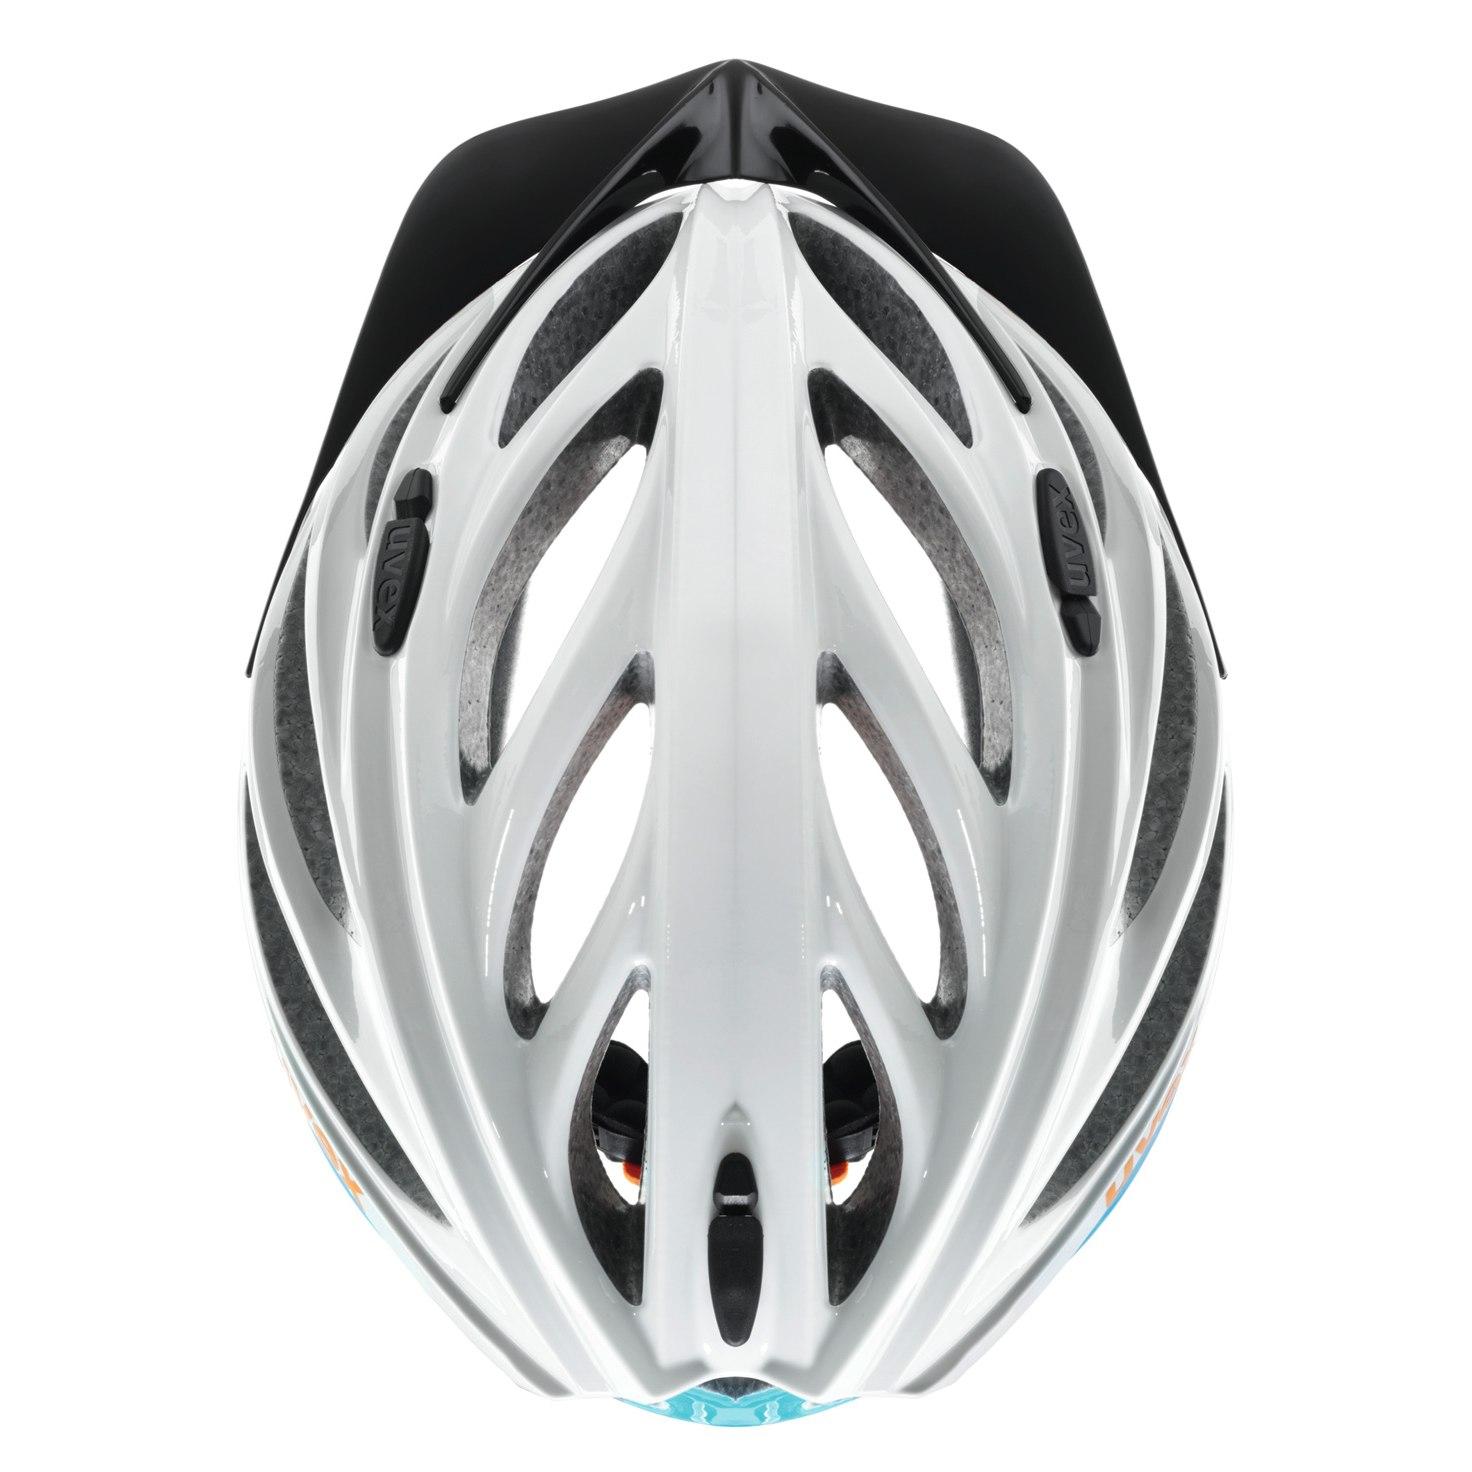 Image of Uvex boss race Helmet - black